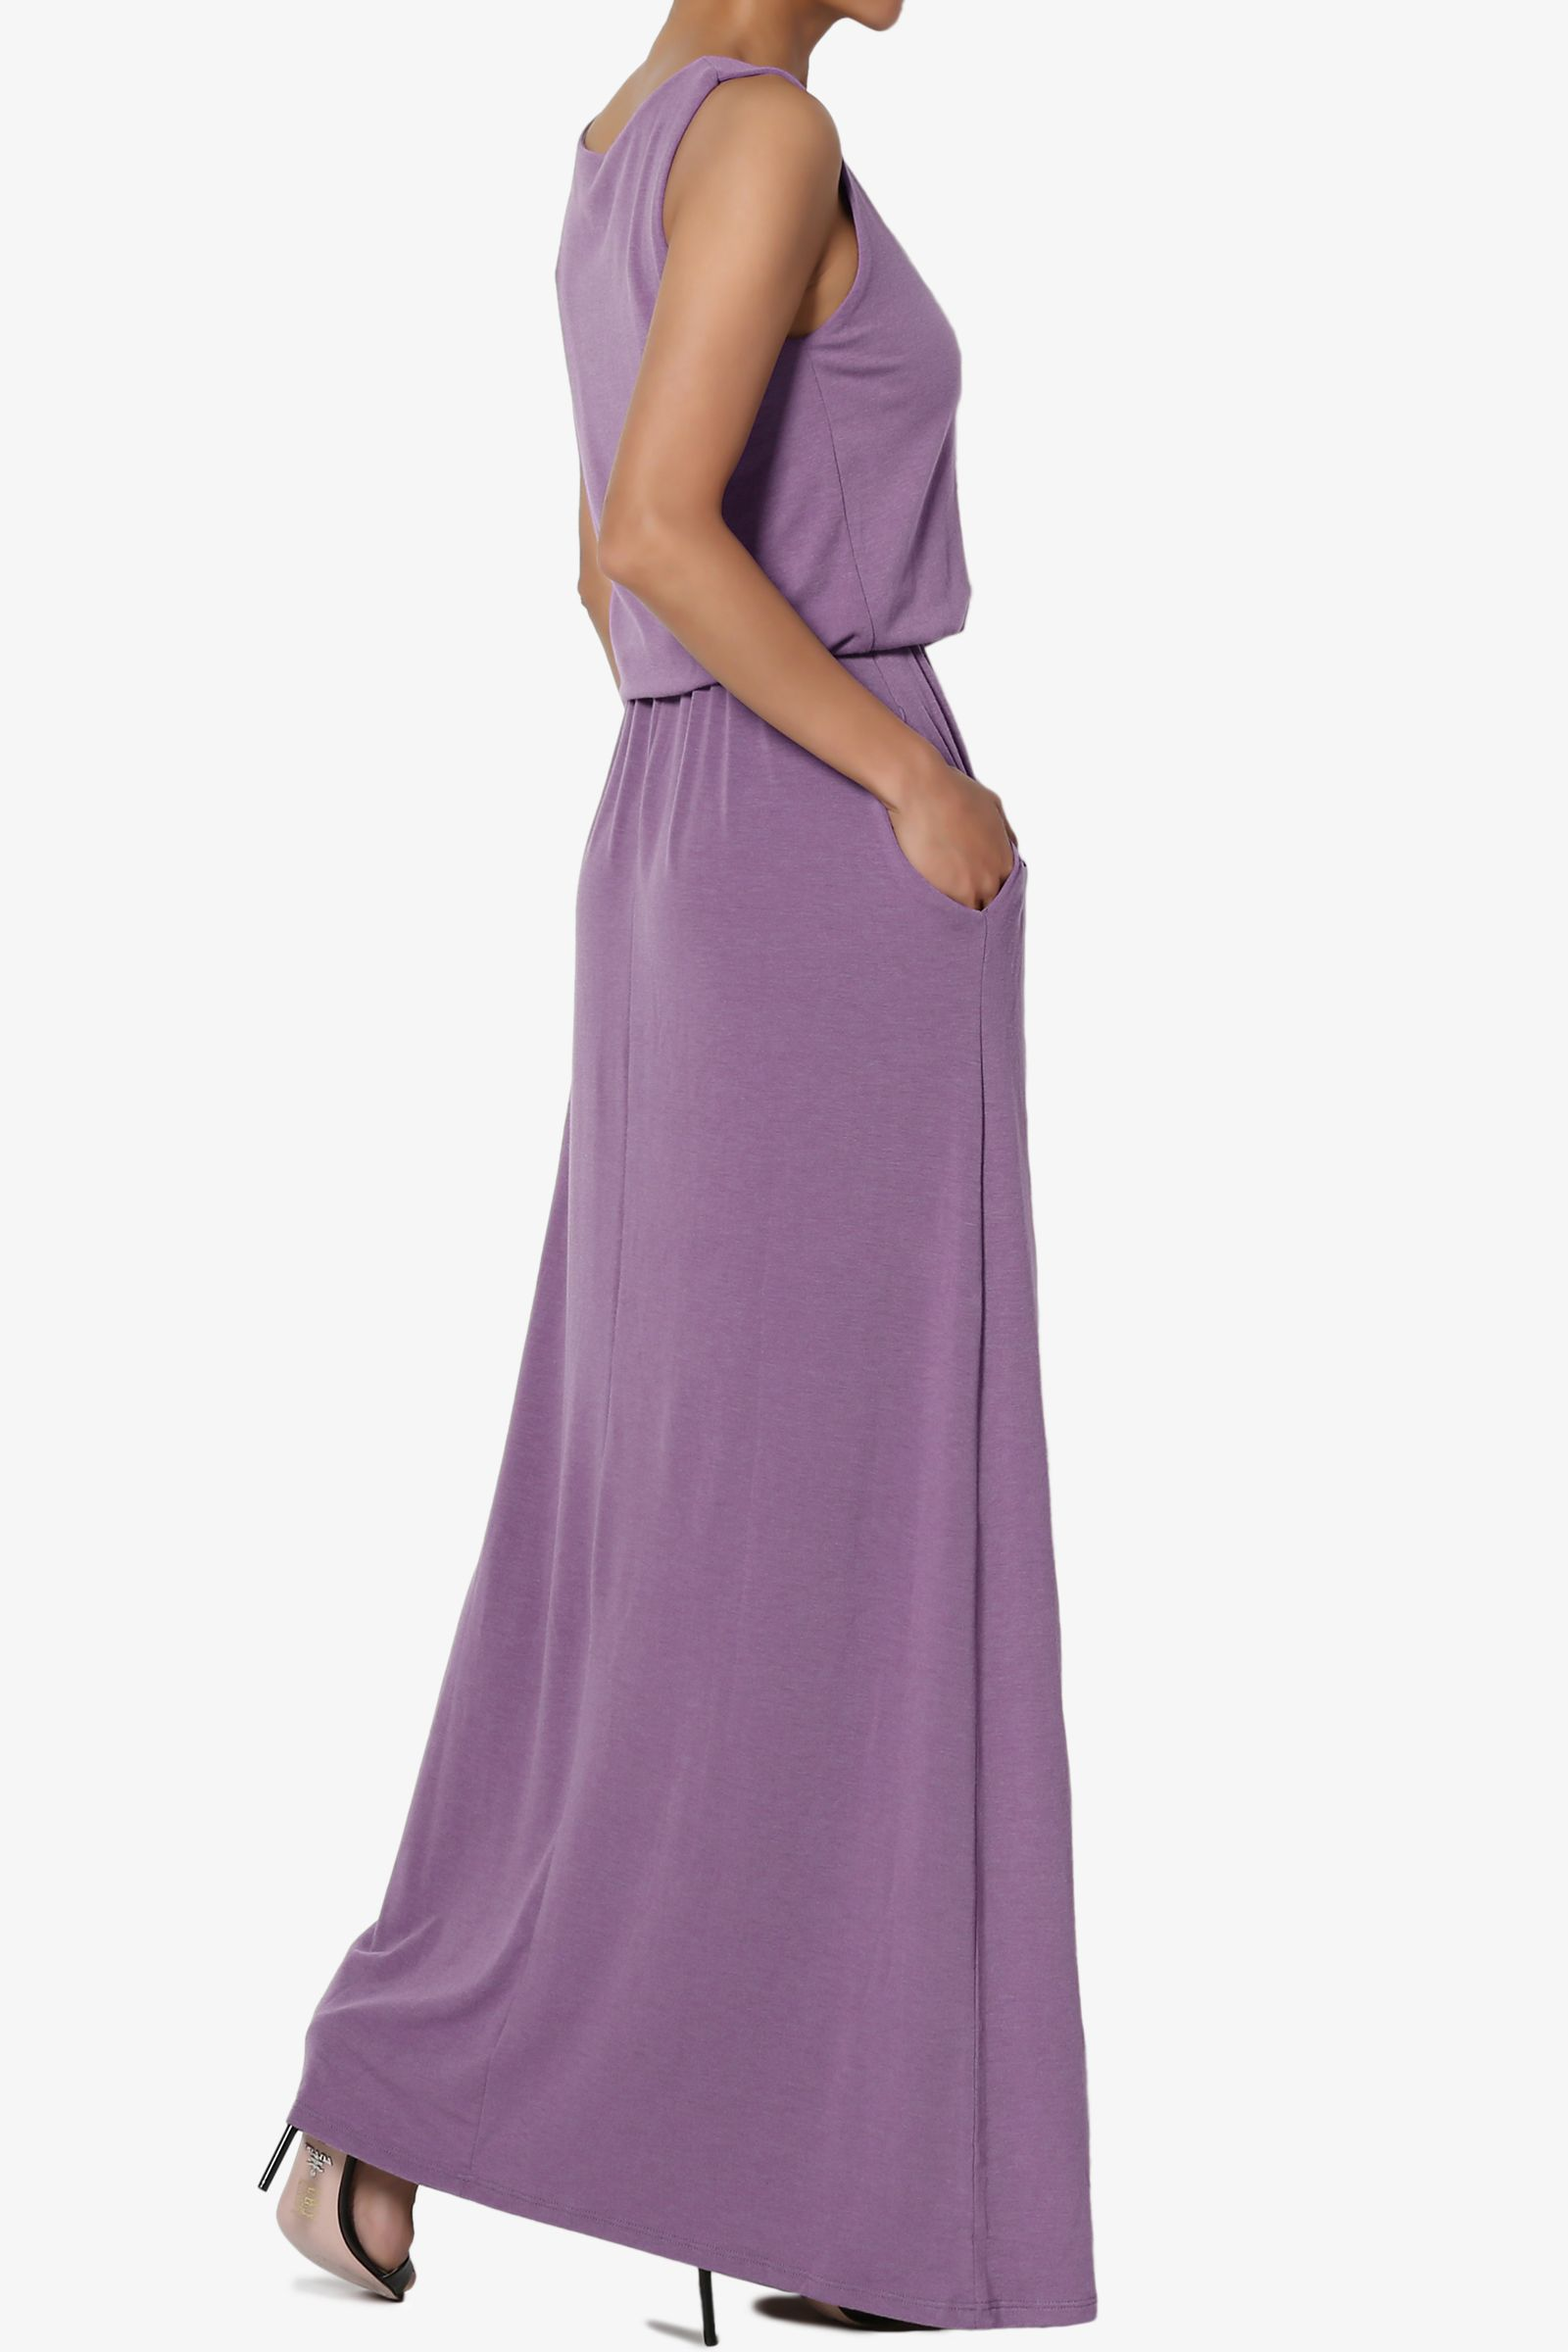 Themogan Themogan Women S S 3x Sleeveless Scoop Neck Blouson Tank Top Long Skirt Maxi Dress Walmart Com Maxi Dress Long Skirt Burgundy Maxi Dress [ 2400 x 1600 Pixel ]